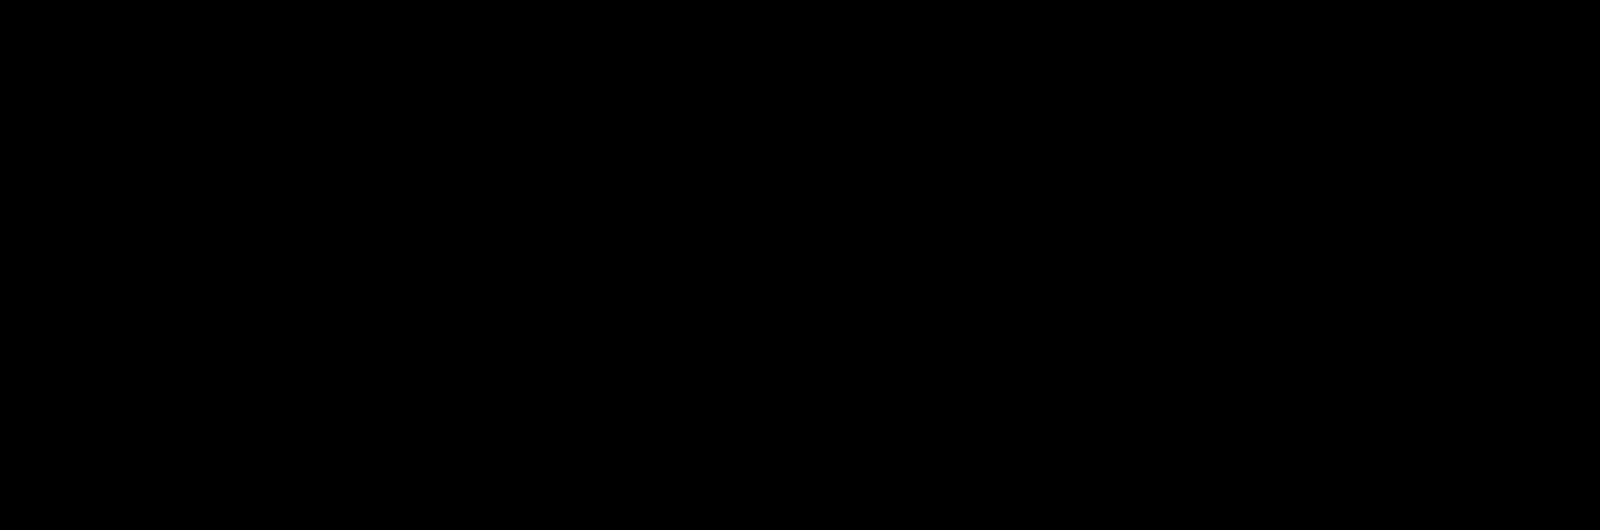 Drawn batman transparent background Dark Clipart clipart Joker Dark